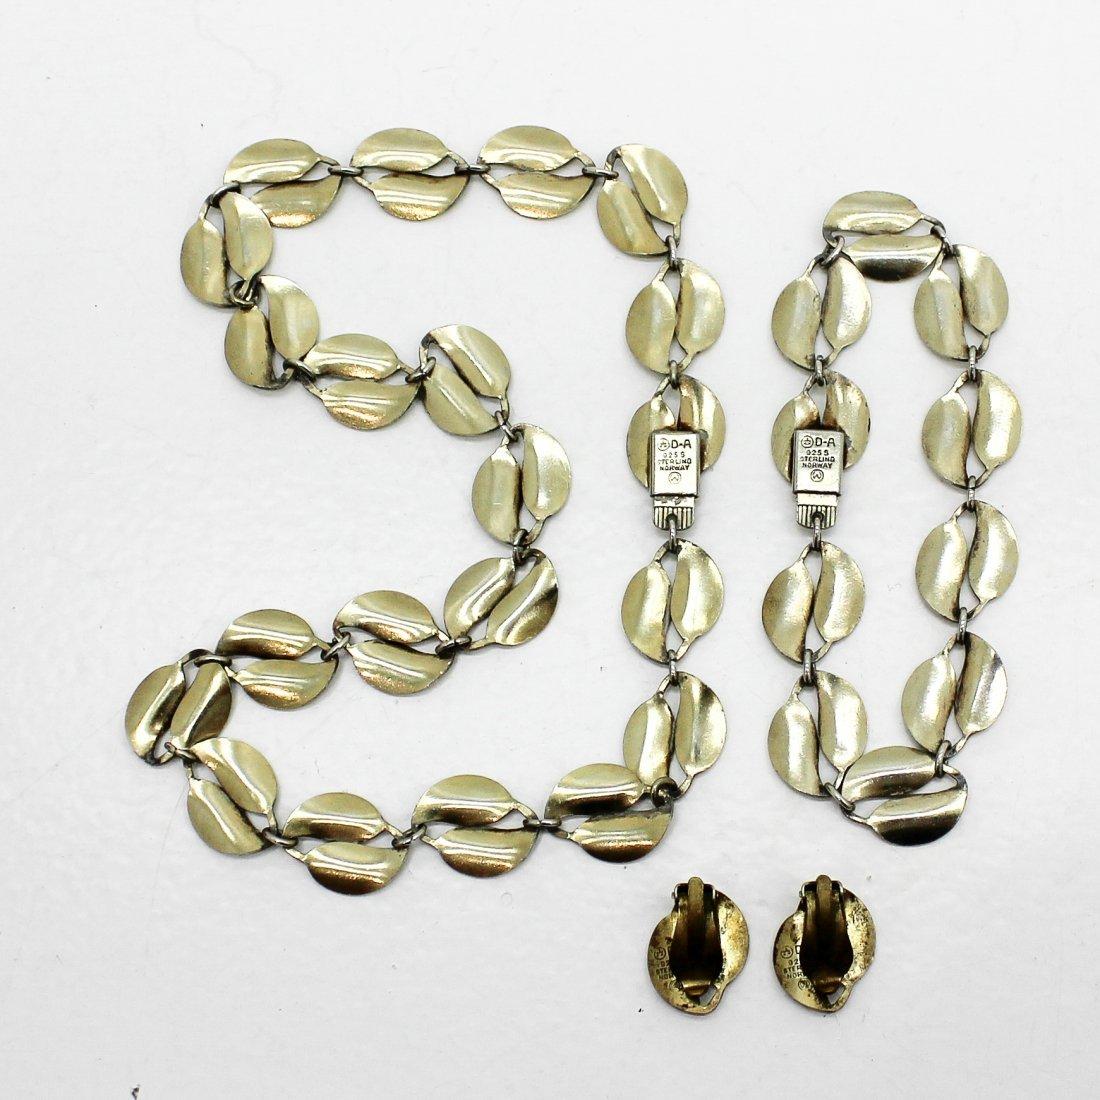 David Andersen Silver and Enamel Jewelry - 2